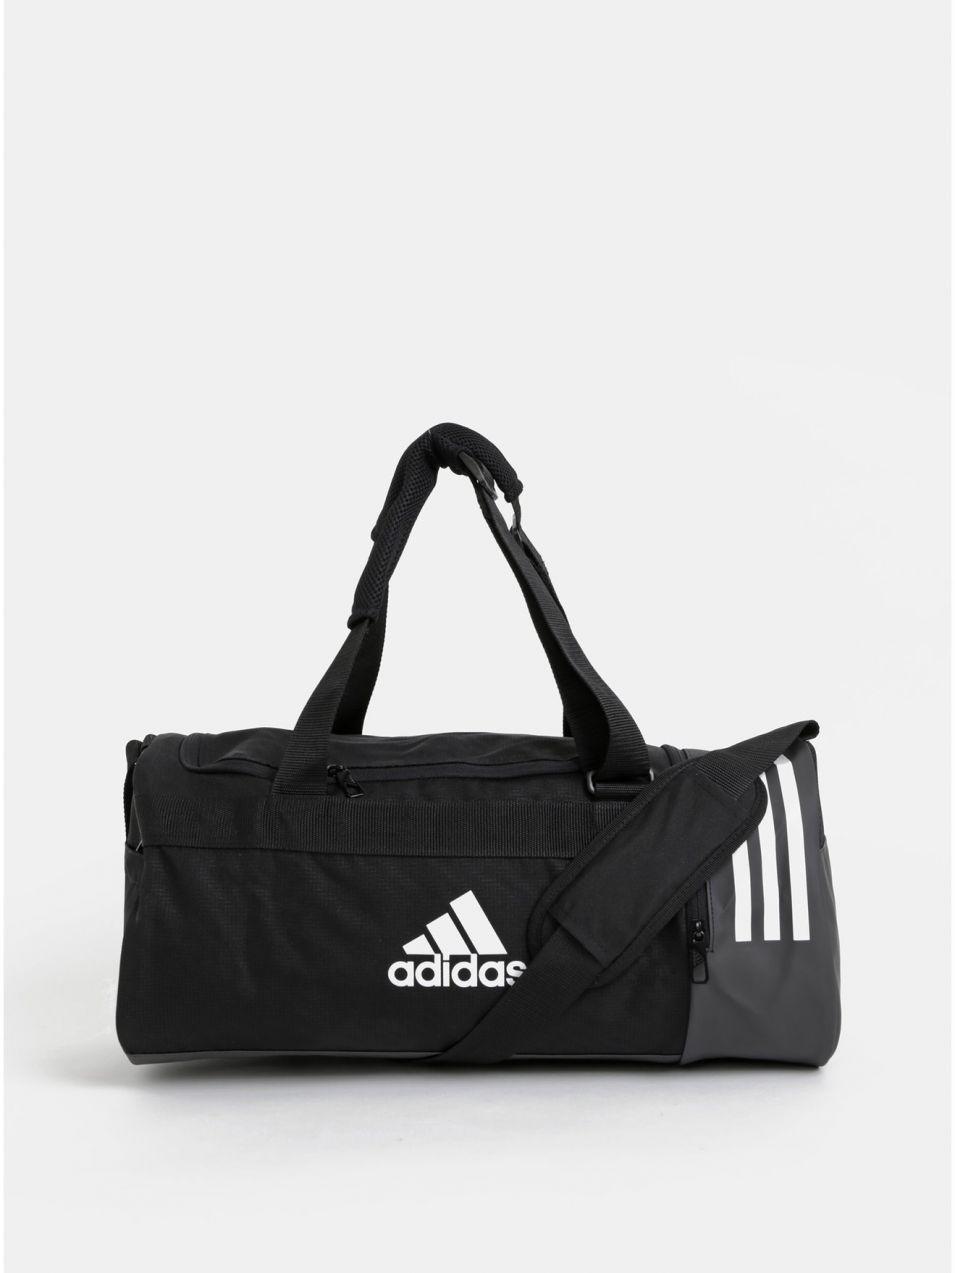 a100ef04a2 Čierna športová taška batoh adidas Performance značky adidas ...